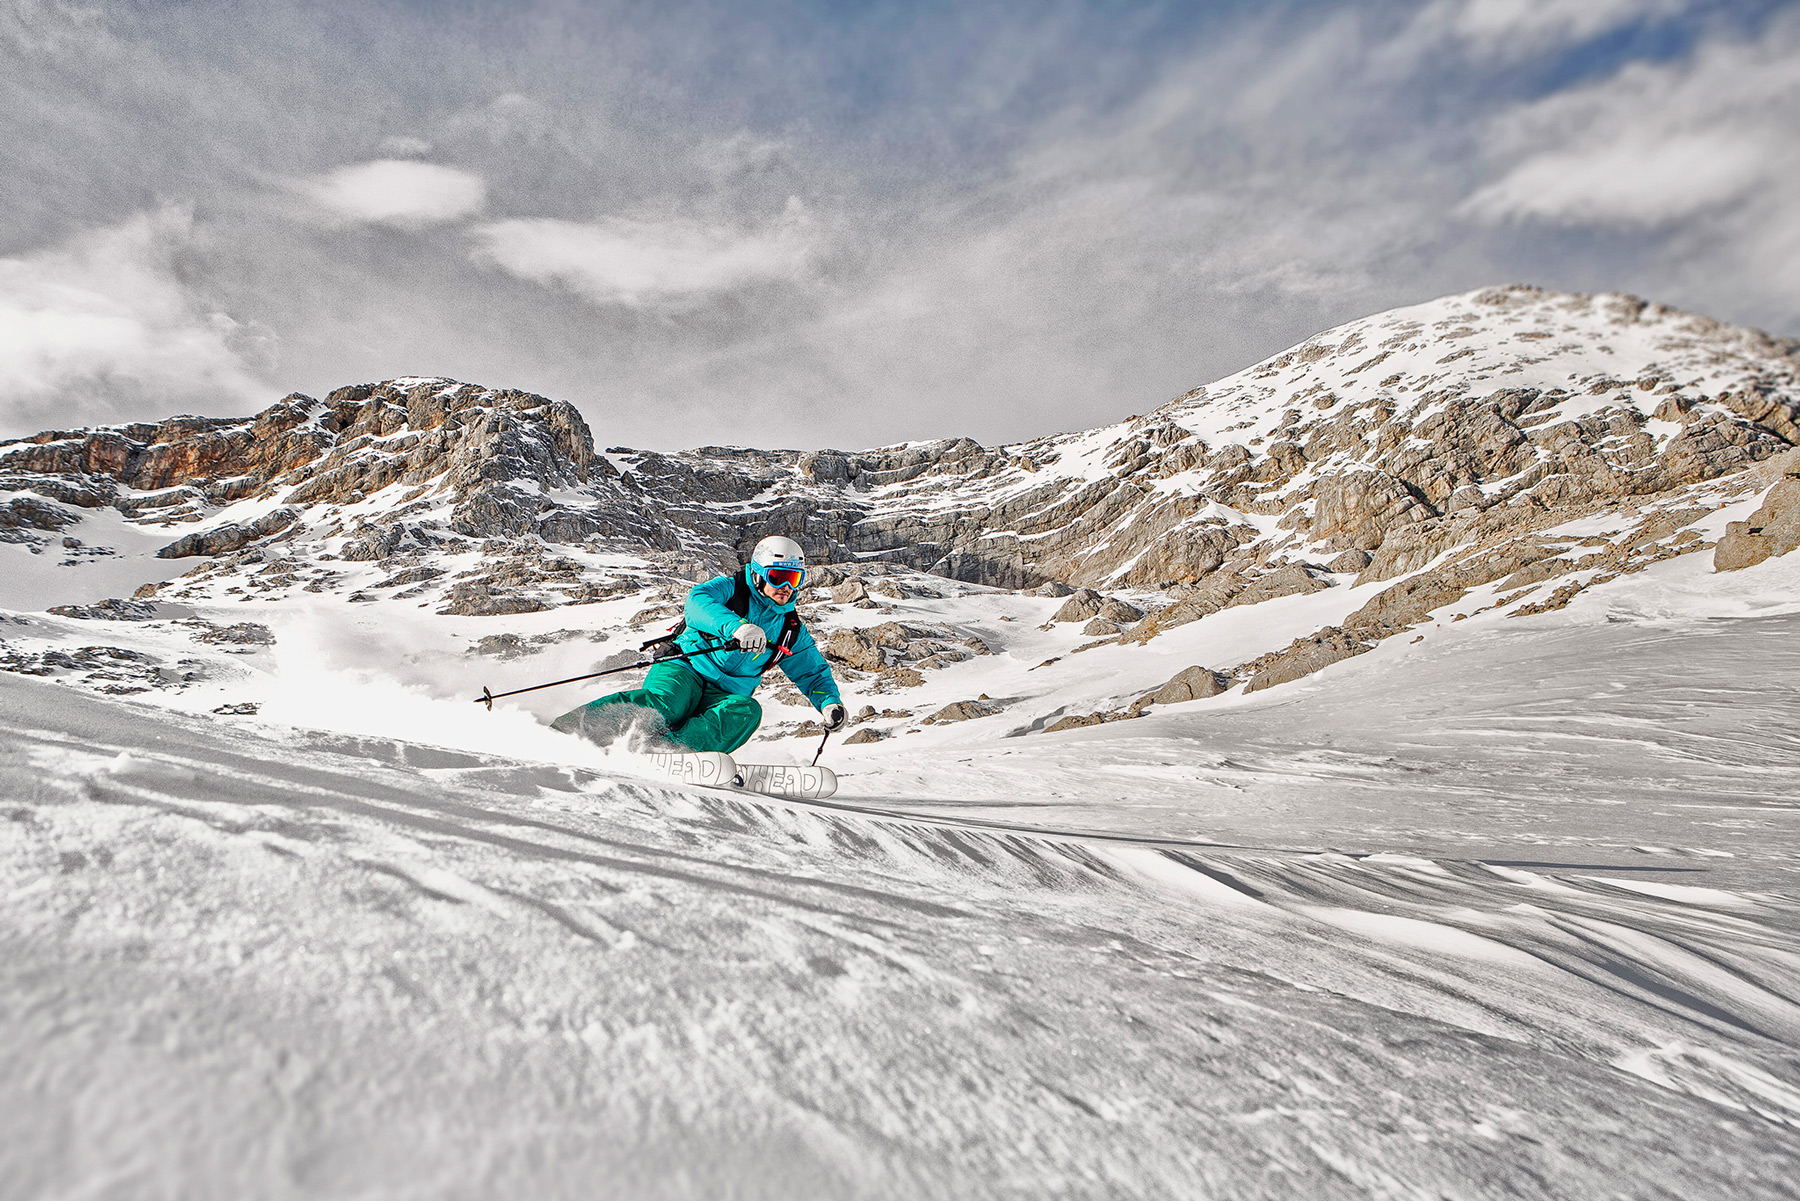 08-Pyua-Dachstein-Ski-Action-Christoph-Gramann